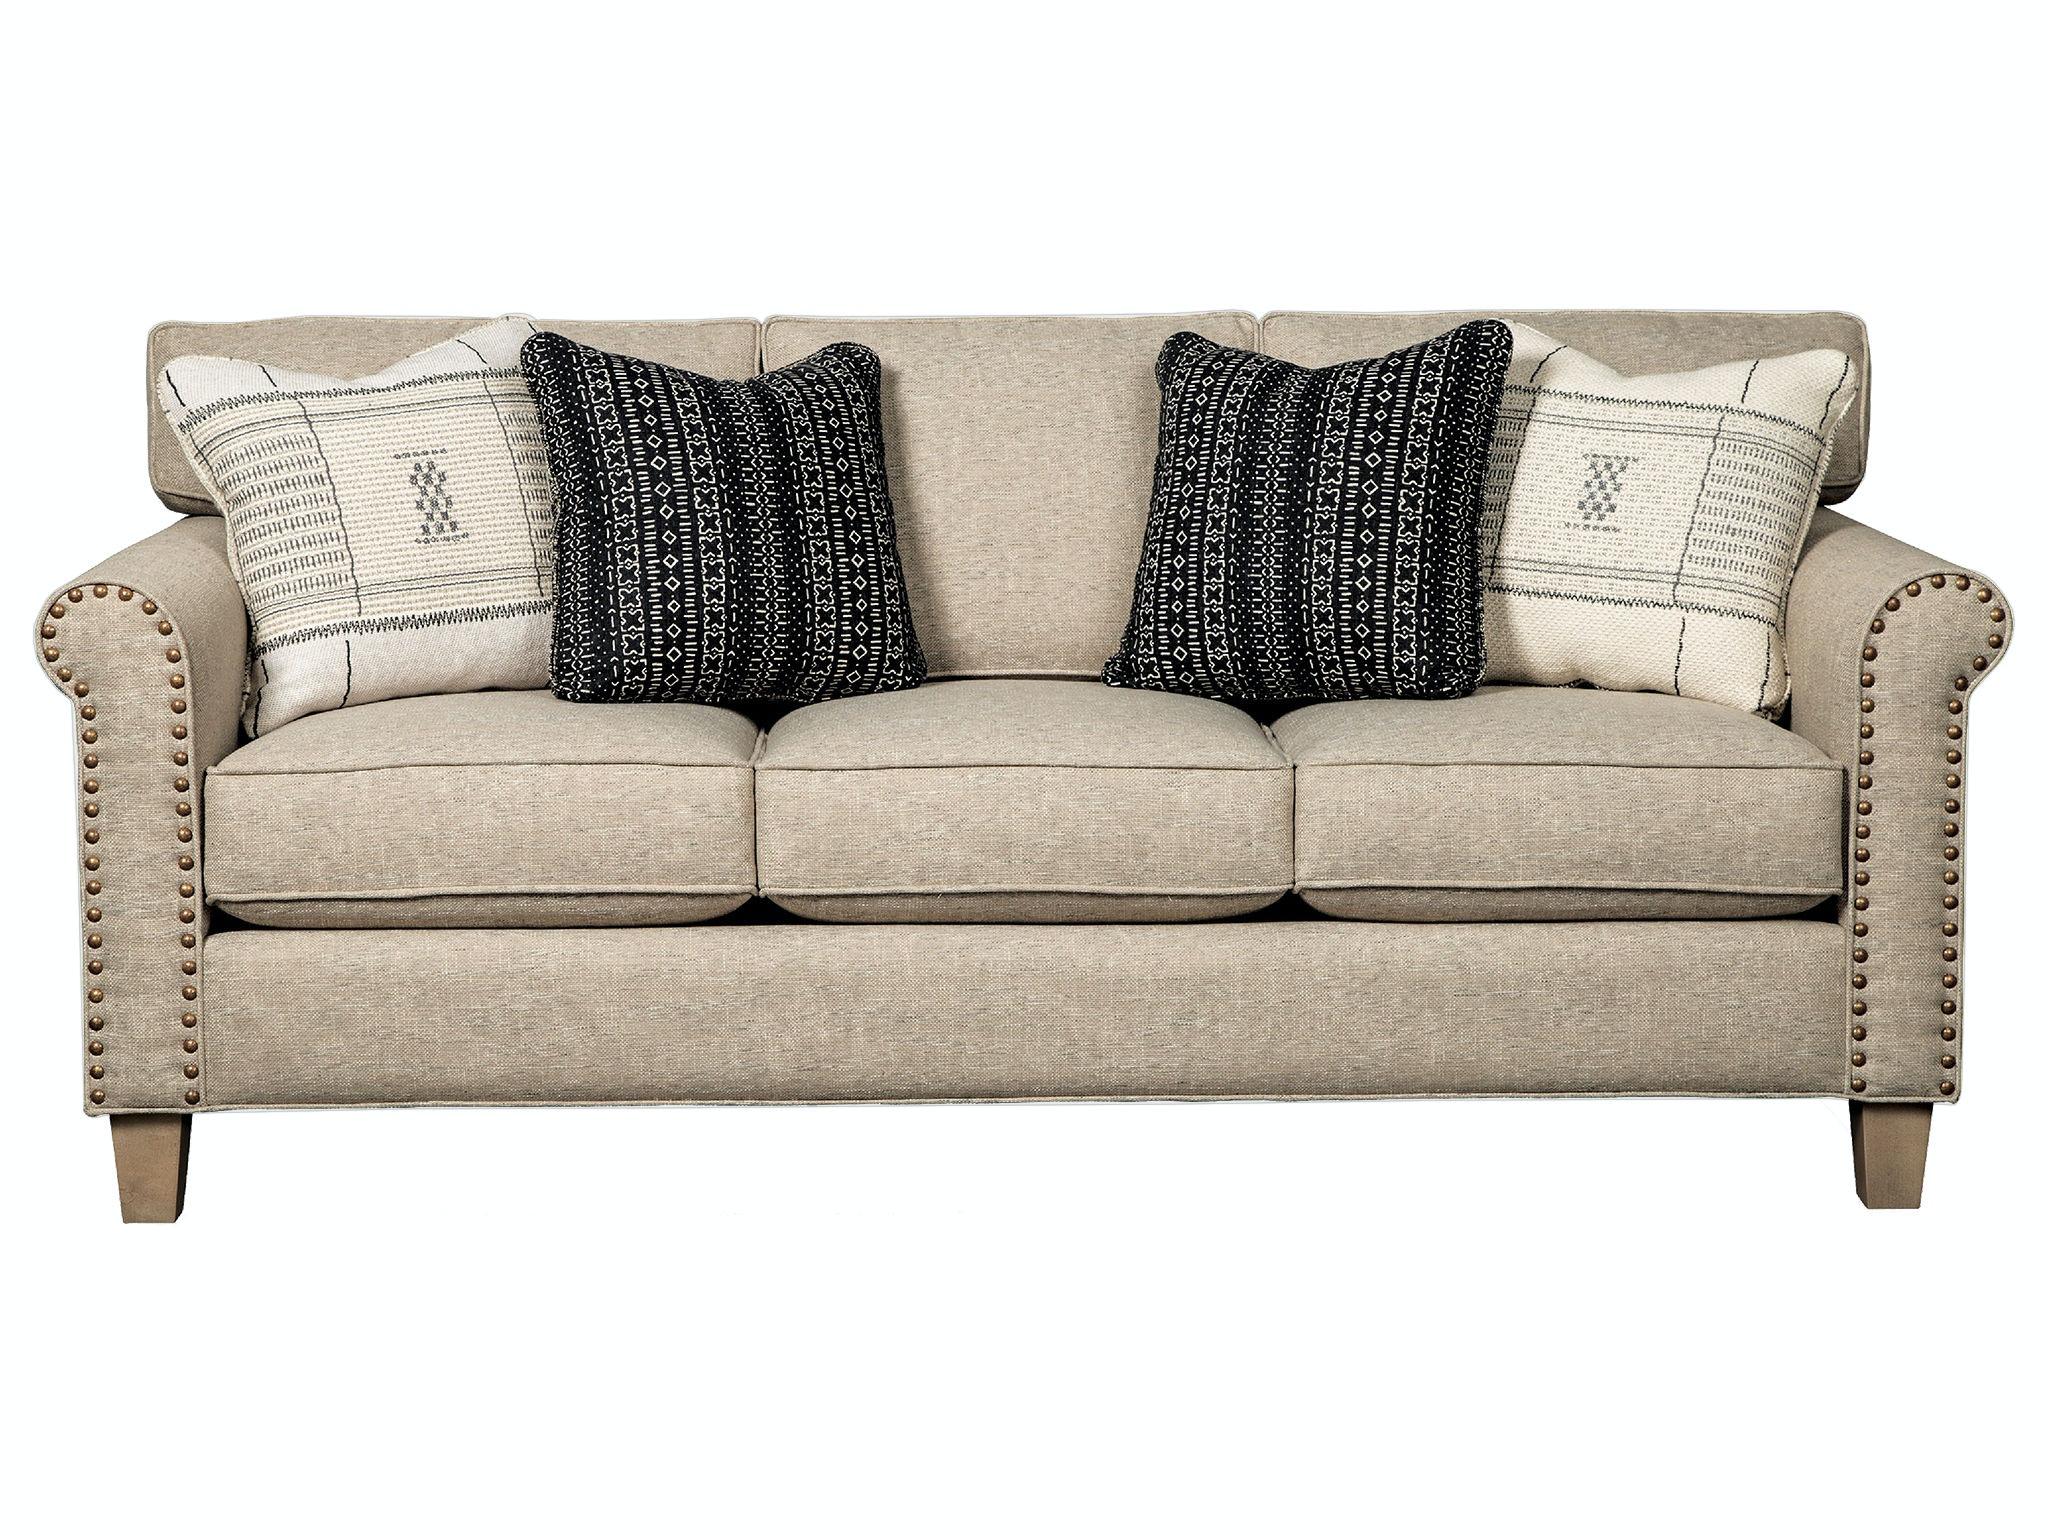 craftmaster living room furniture modern tables for sofa 778850 hiddenite nc